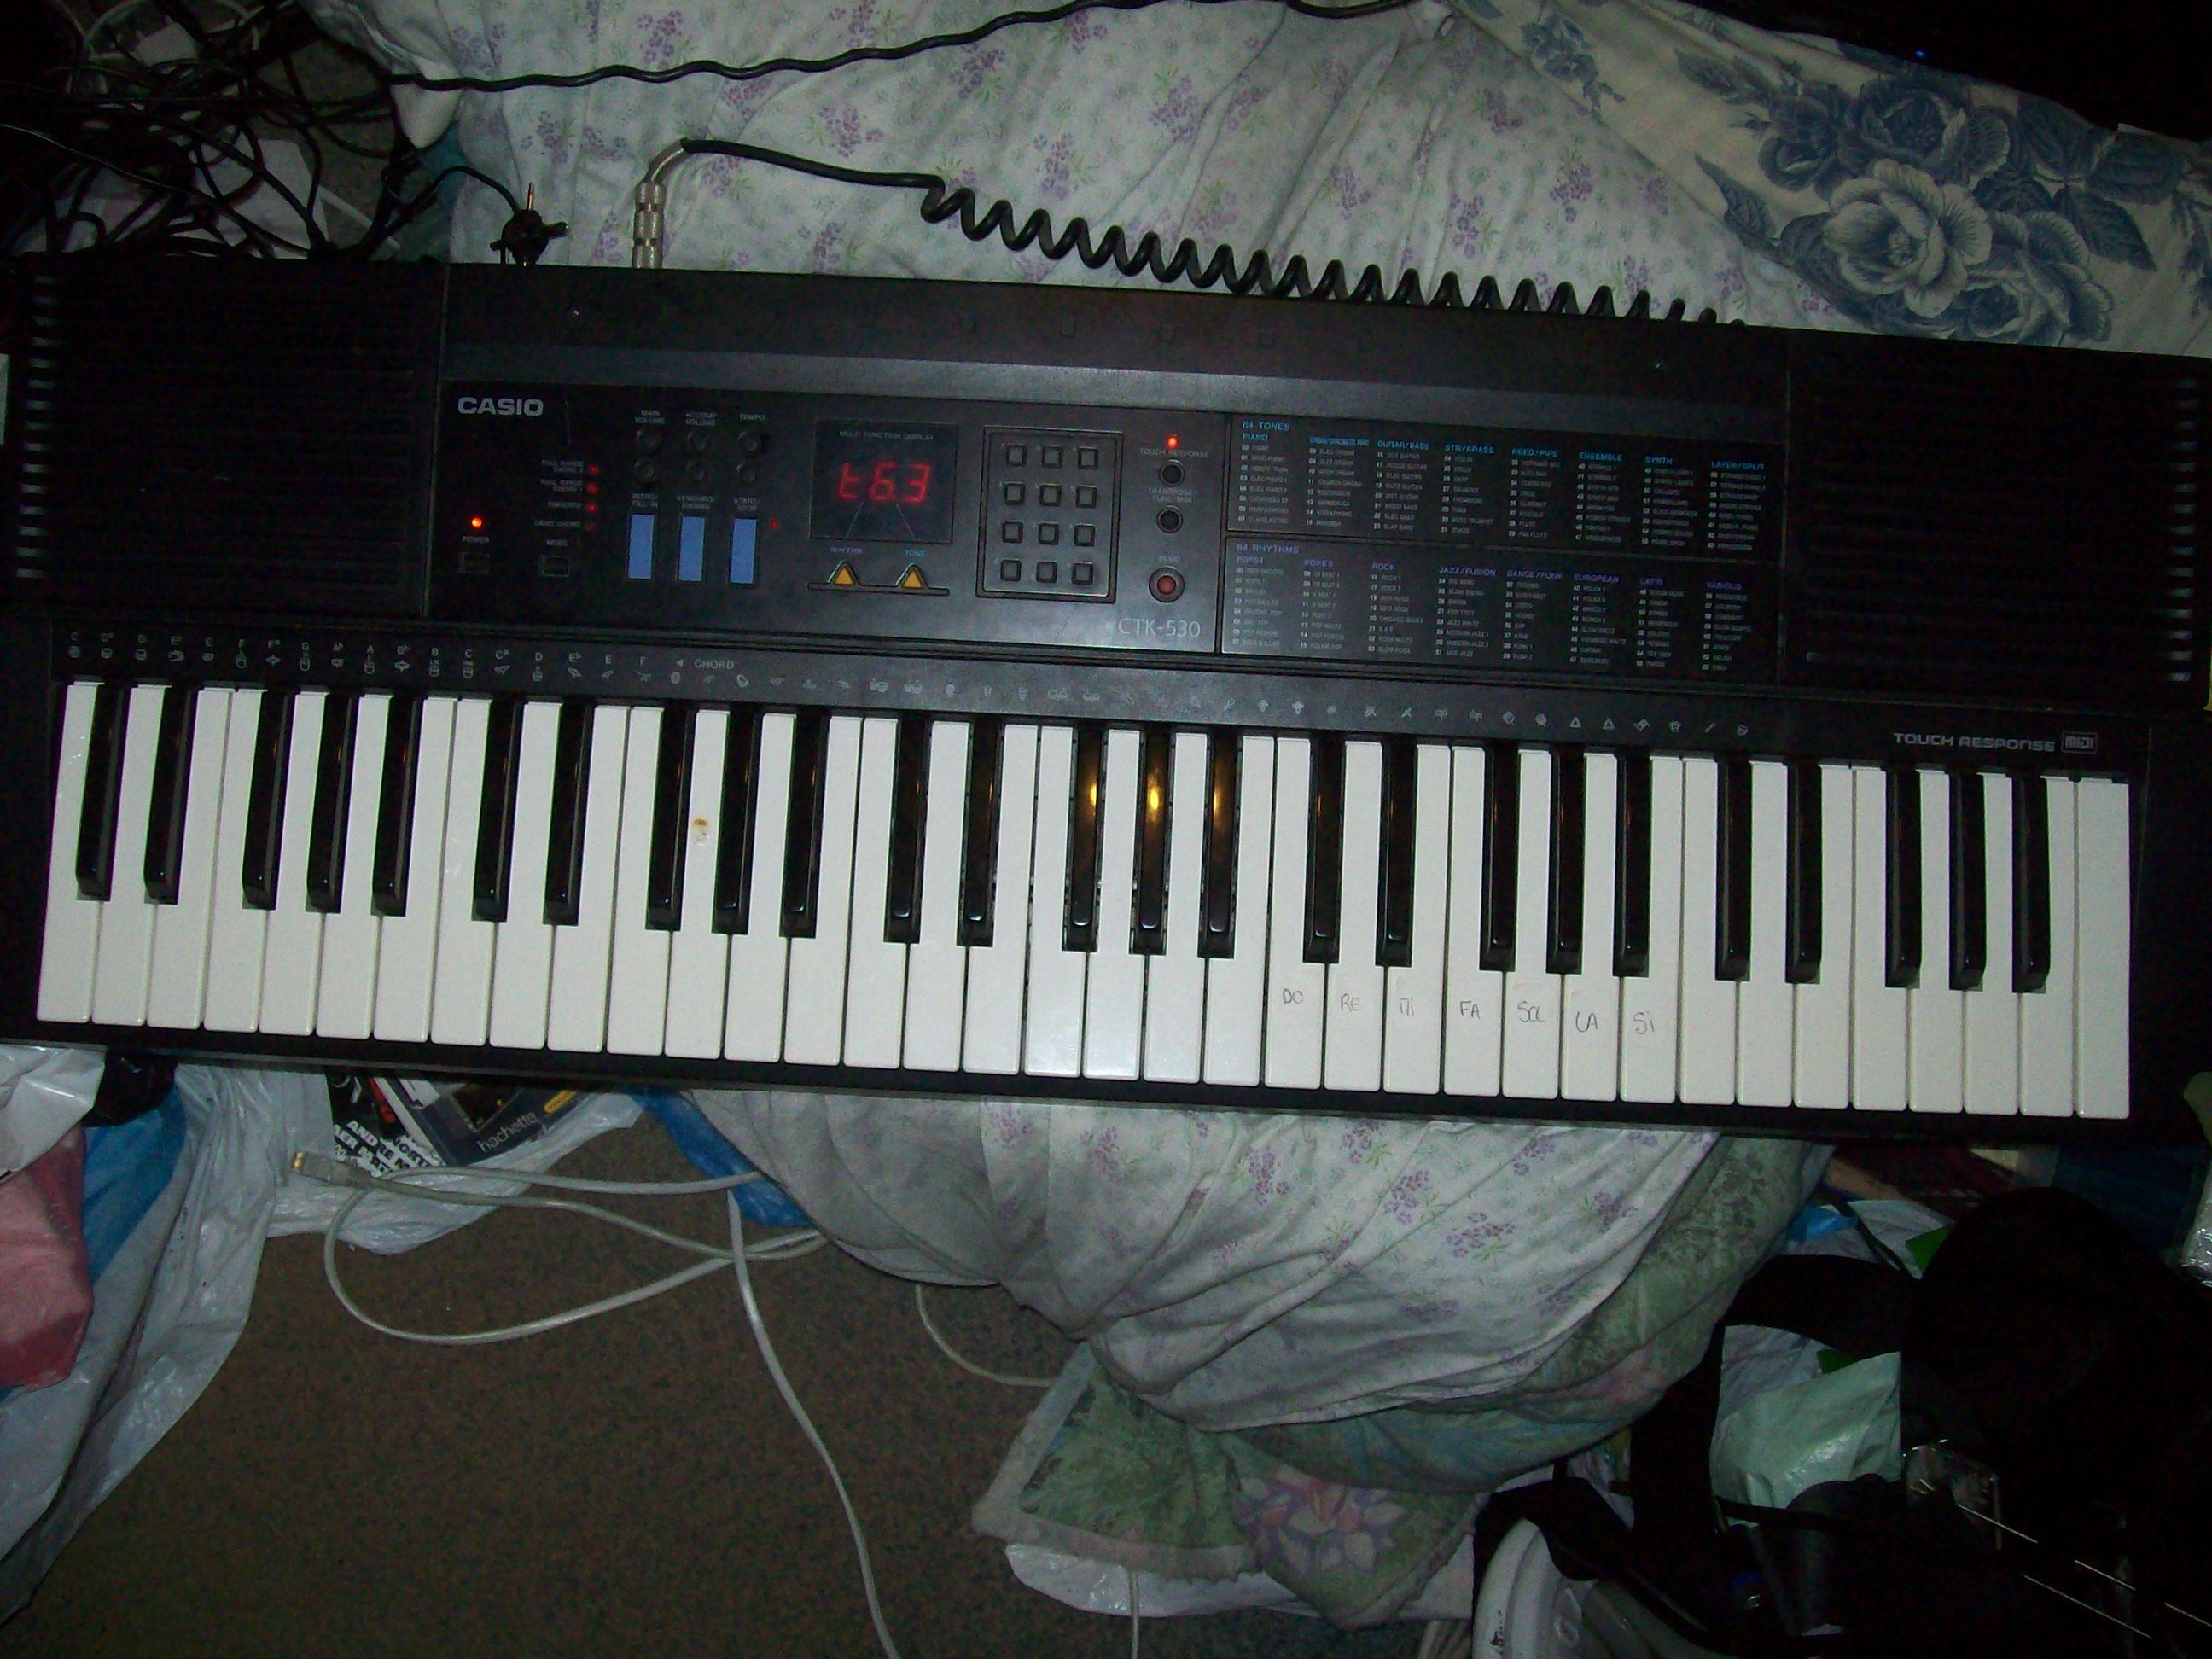 casio ctk 530 image 427231 audiofanzine rh en audiofanzine com Casio Ctk 8000 Casio Keyboard CTK 591